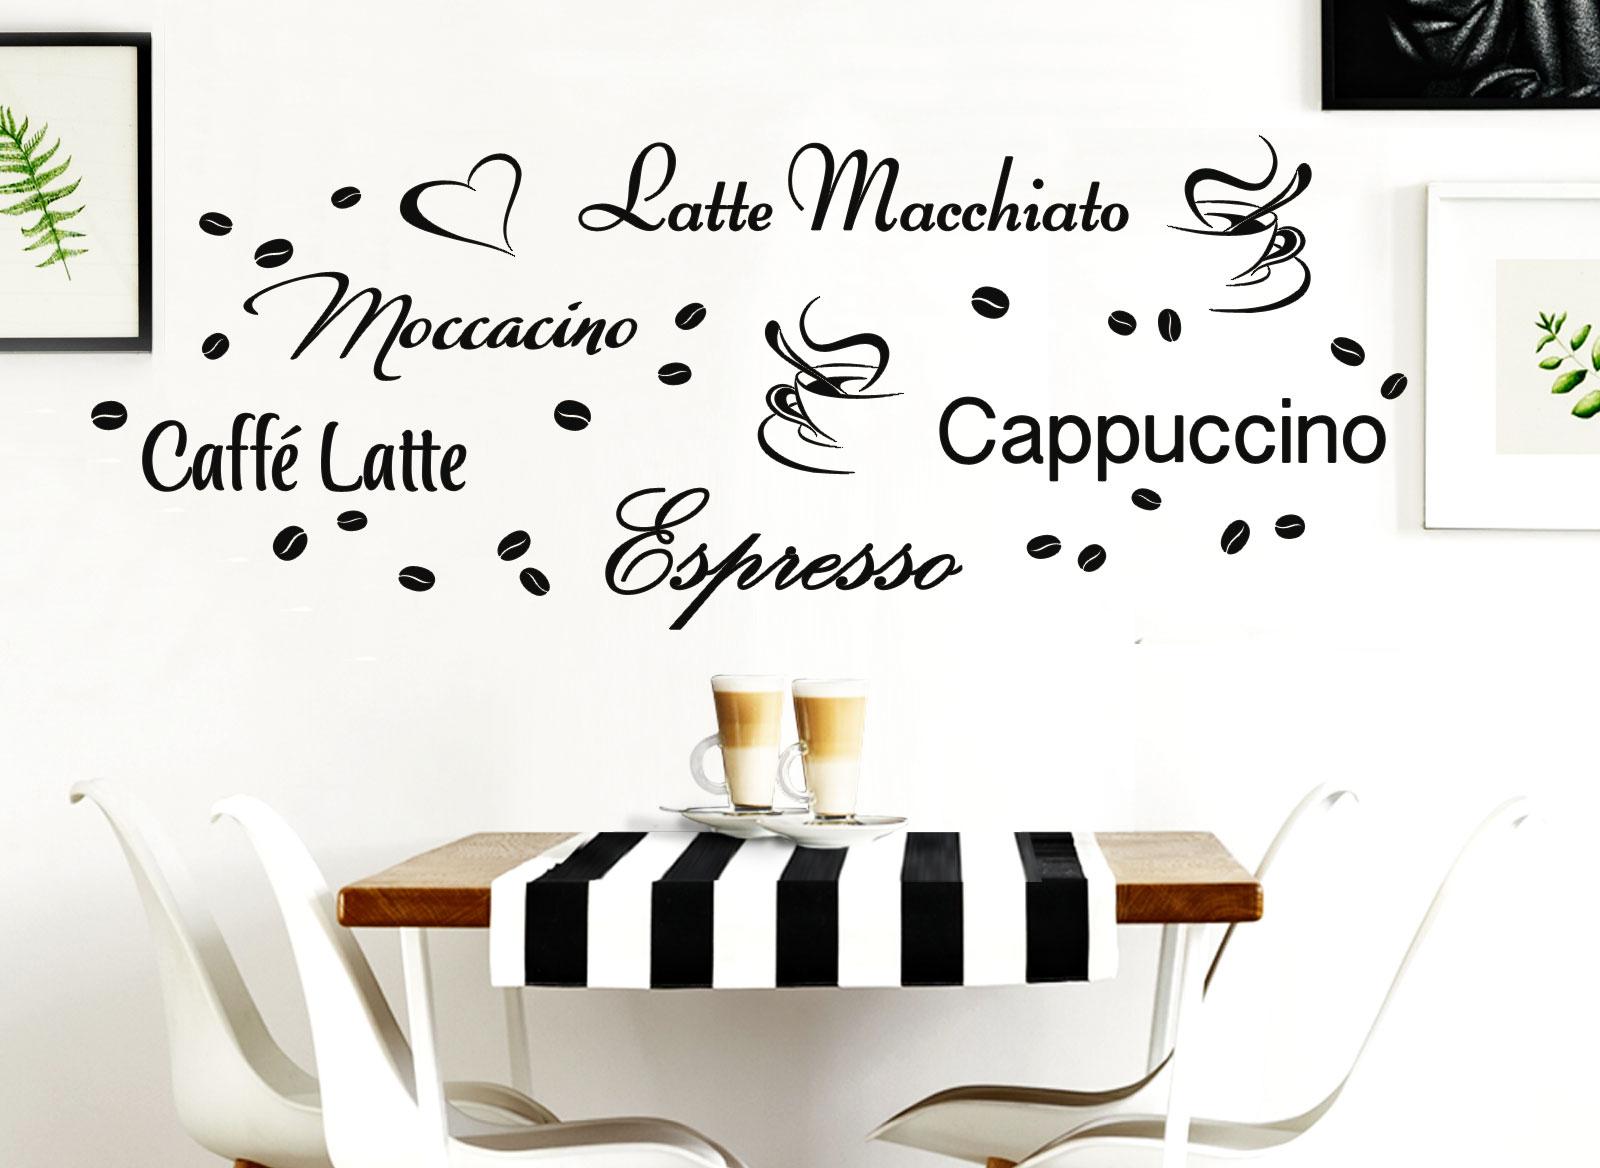 Großartig Wandtattoo Anbringen Beste Wahl - Latte Macchiato Moccacino Csuperbuccino Espresso Caffe